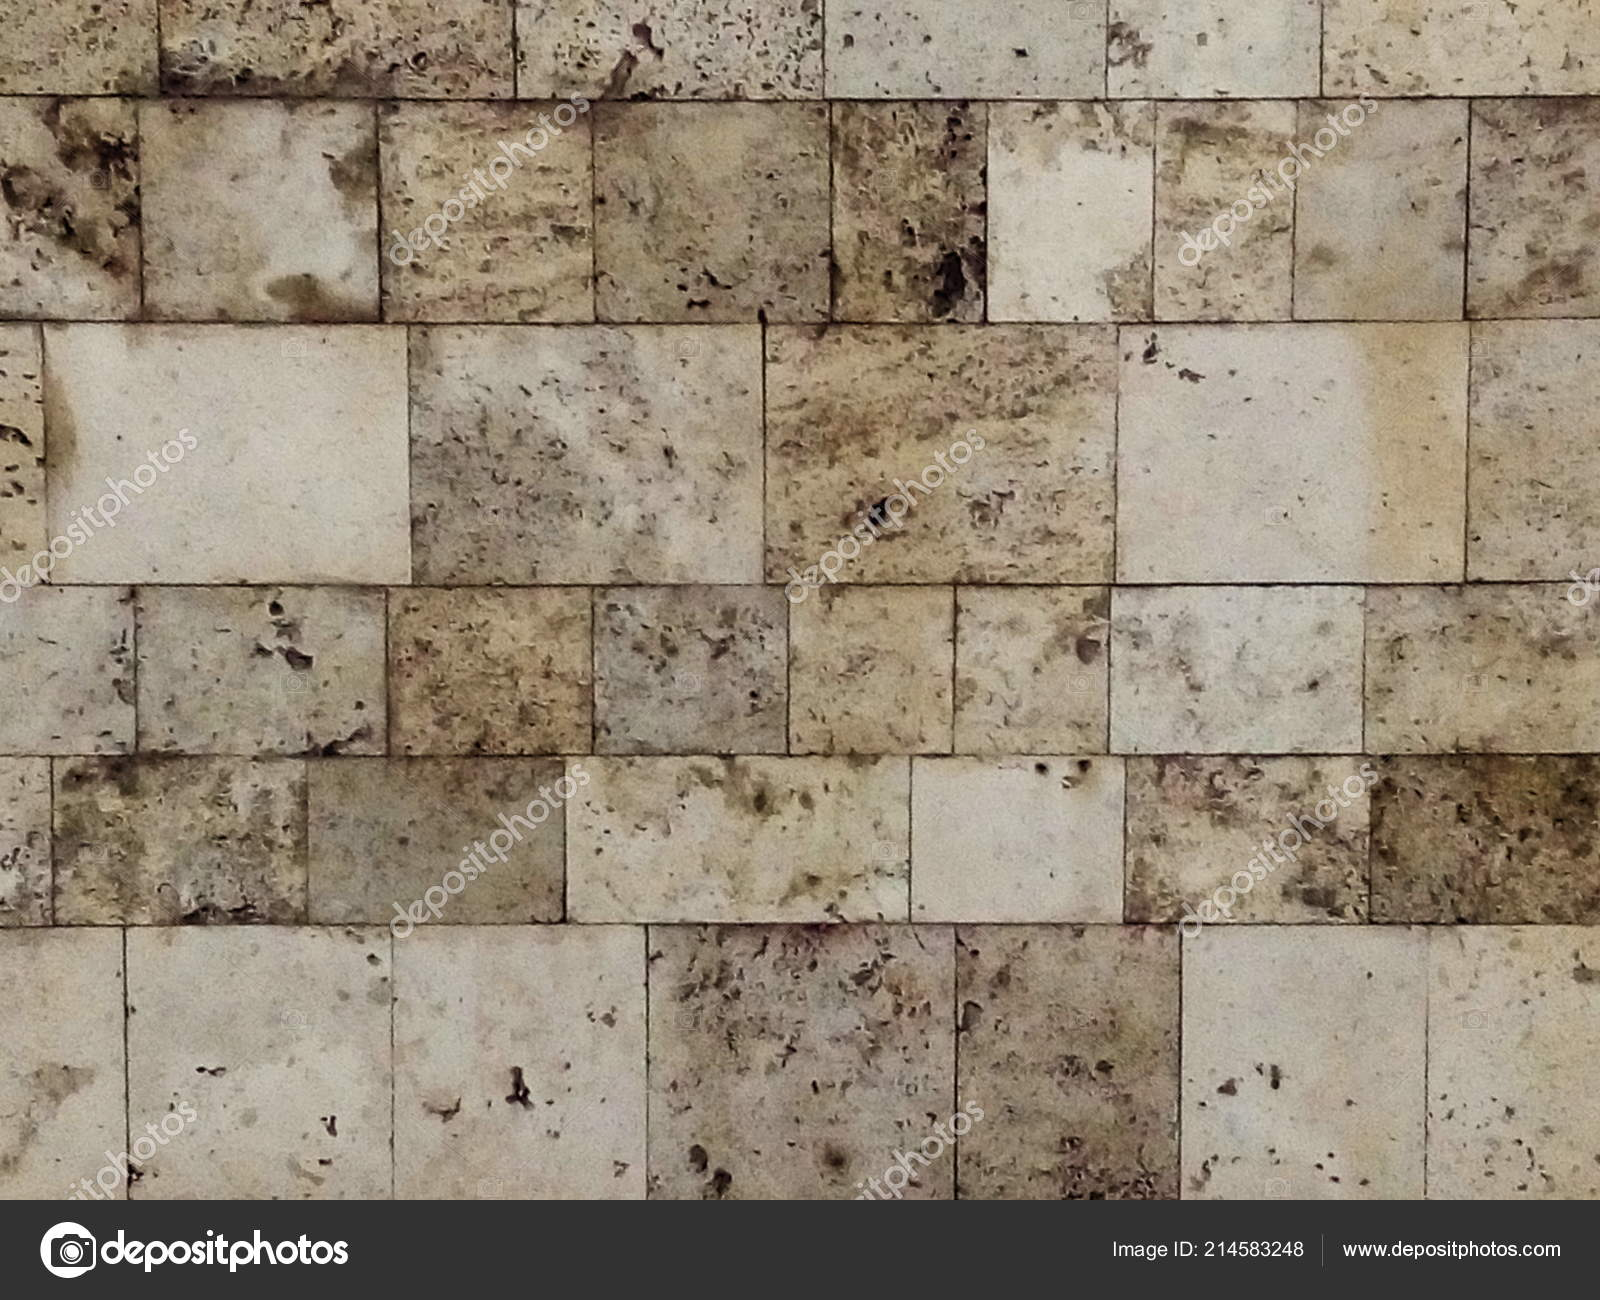 Marble Stone Flooring Designs Marble Tile Texture Floor Tiles Wall Background White Pattern Stone Stock Photo C Vladimir991 214583248